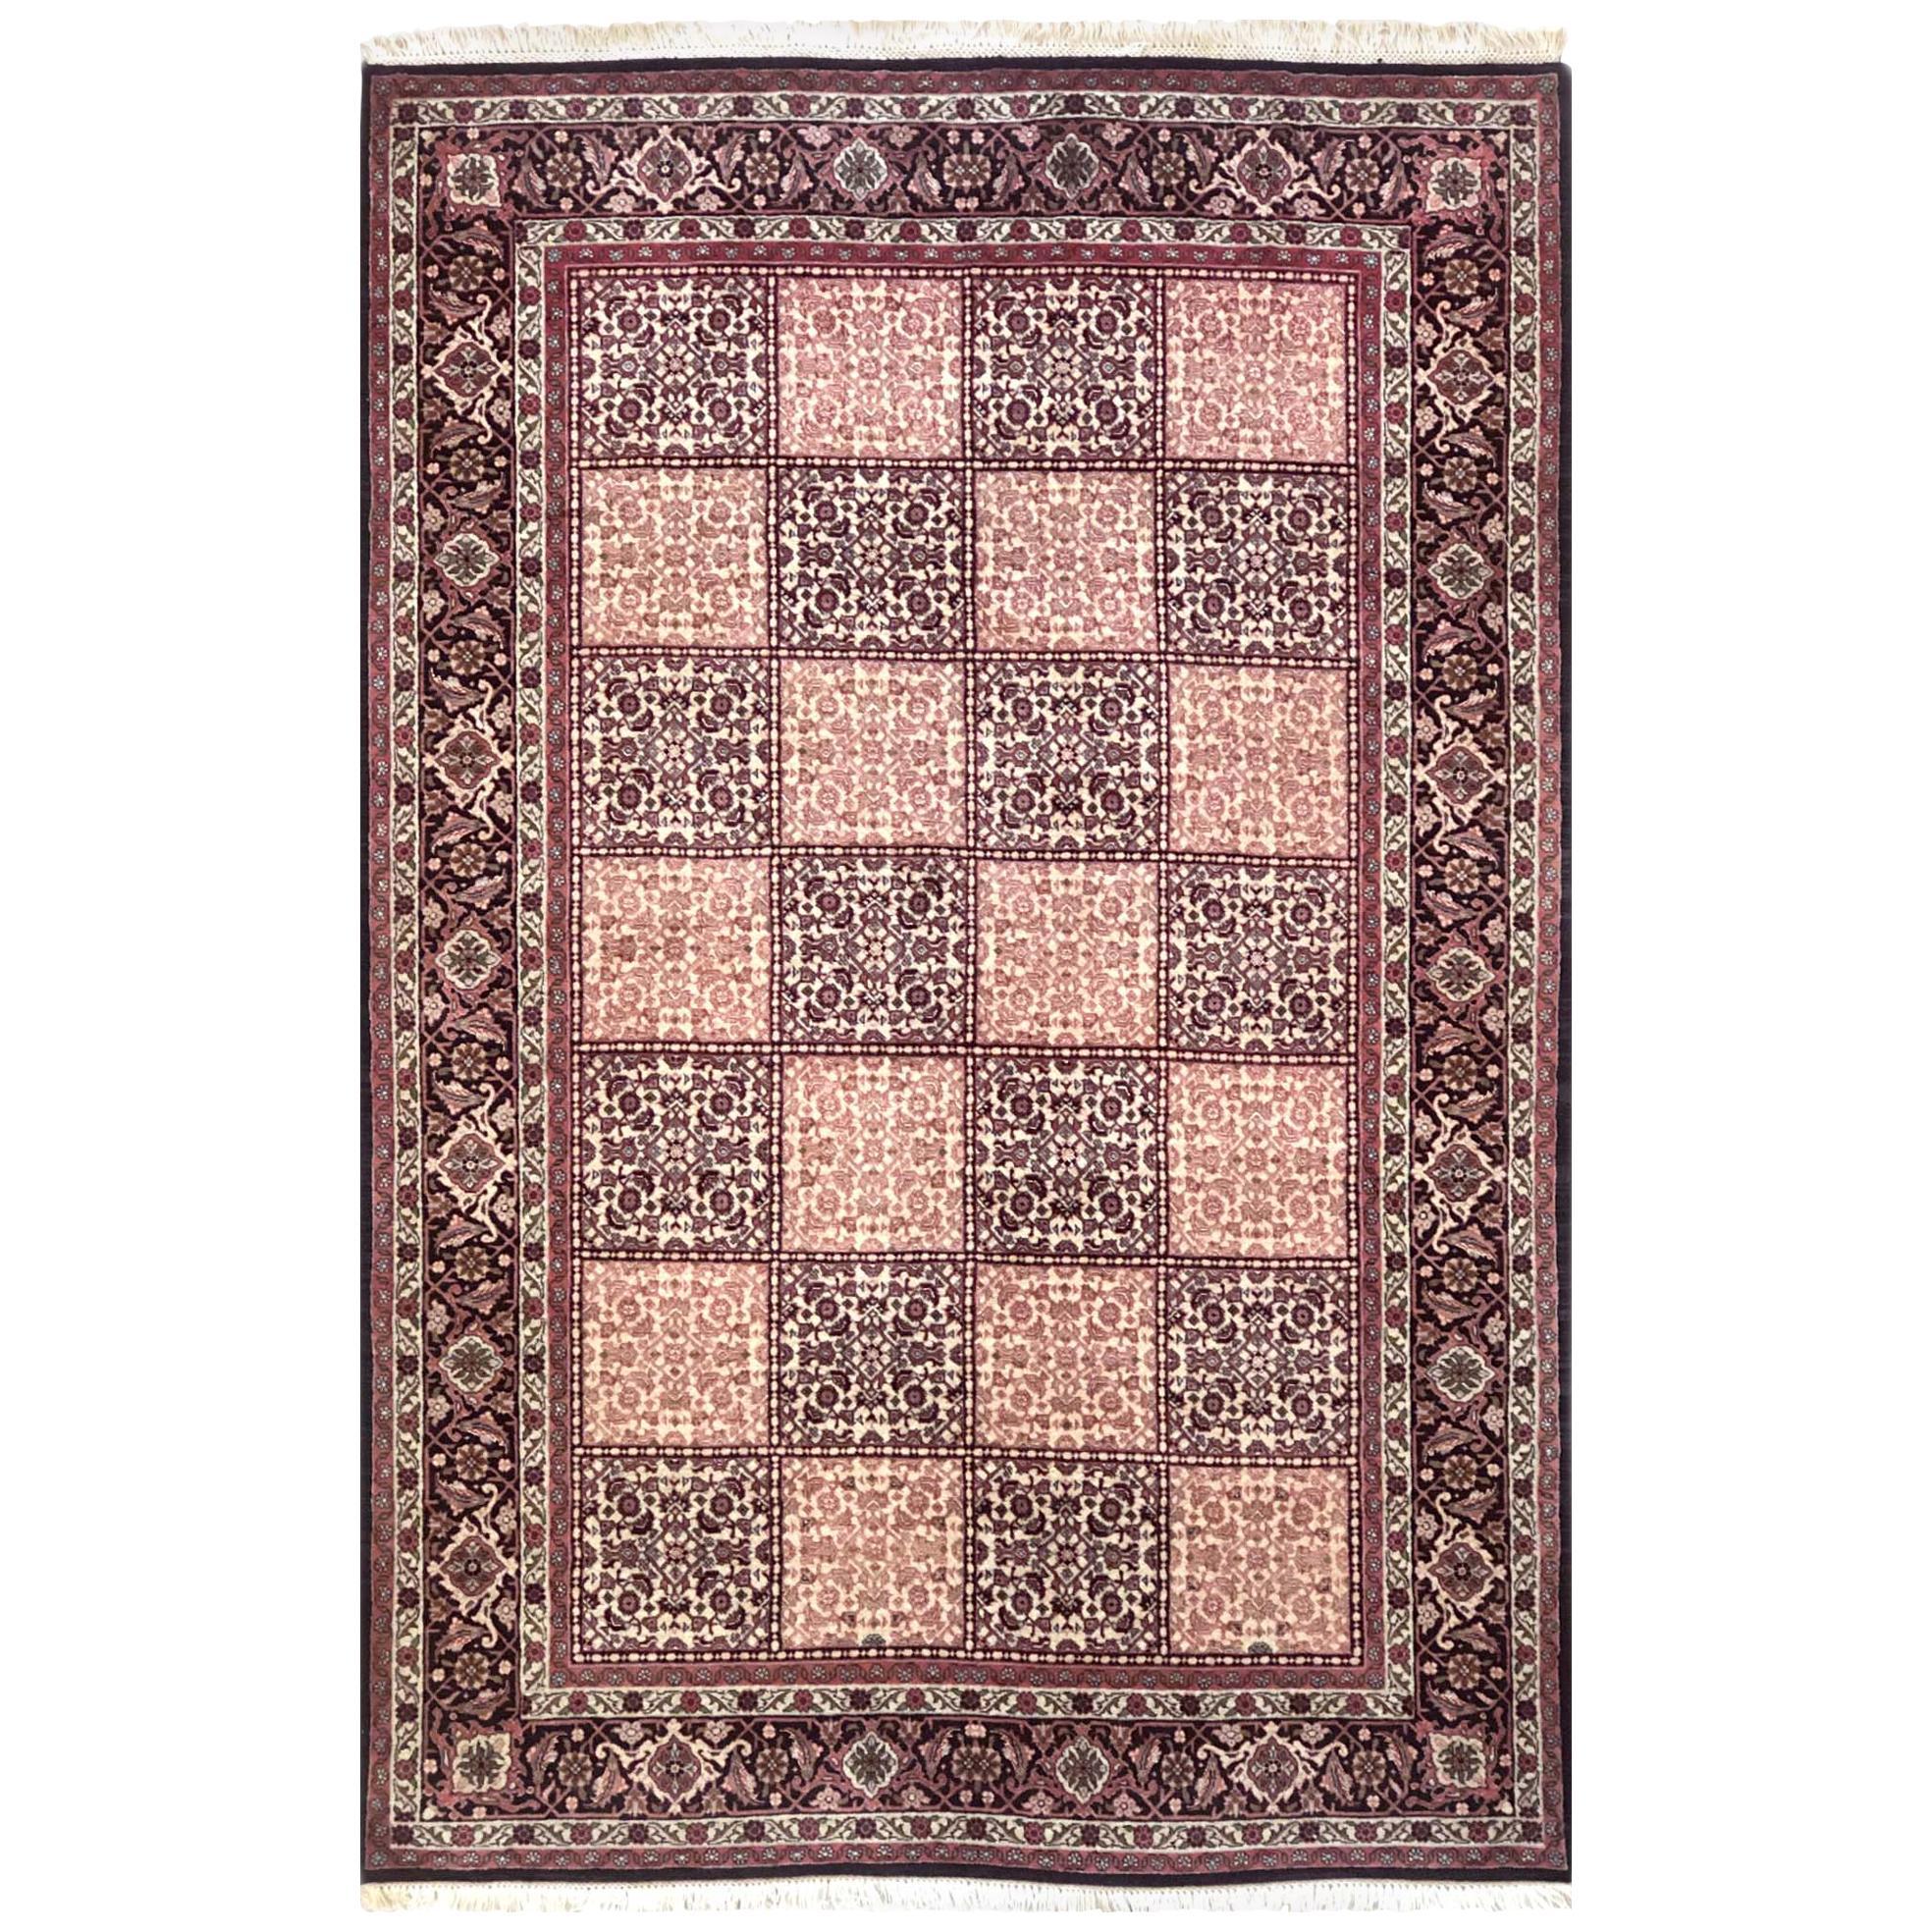 Persian Hand Knotted Red Cream Panel Design Bijar 'Bidjar' Rug